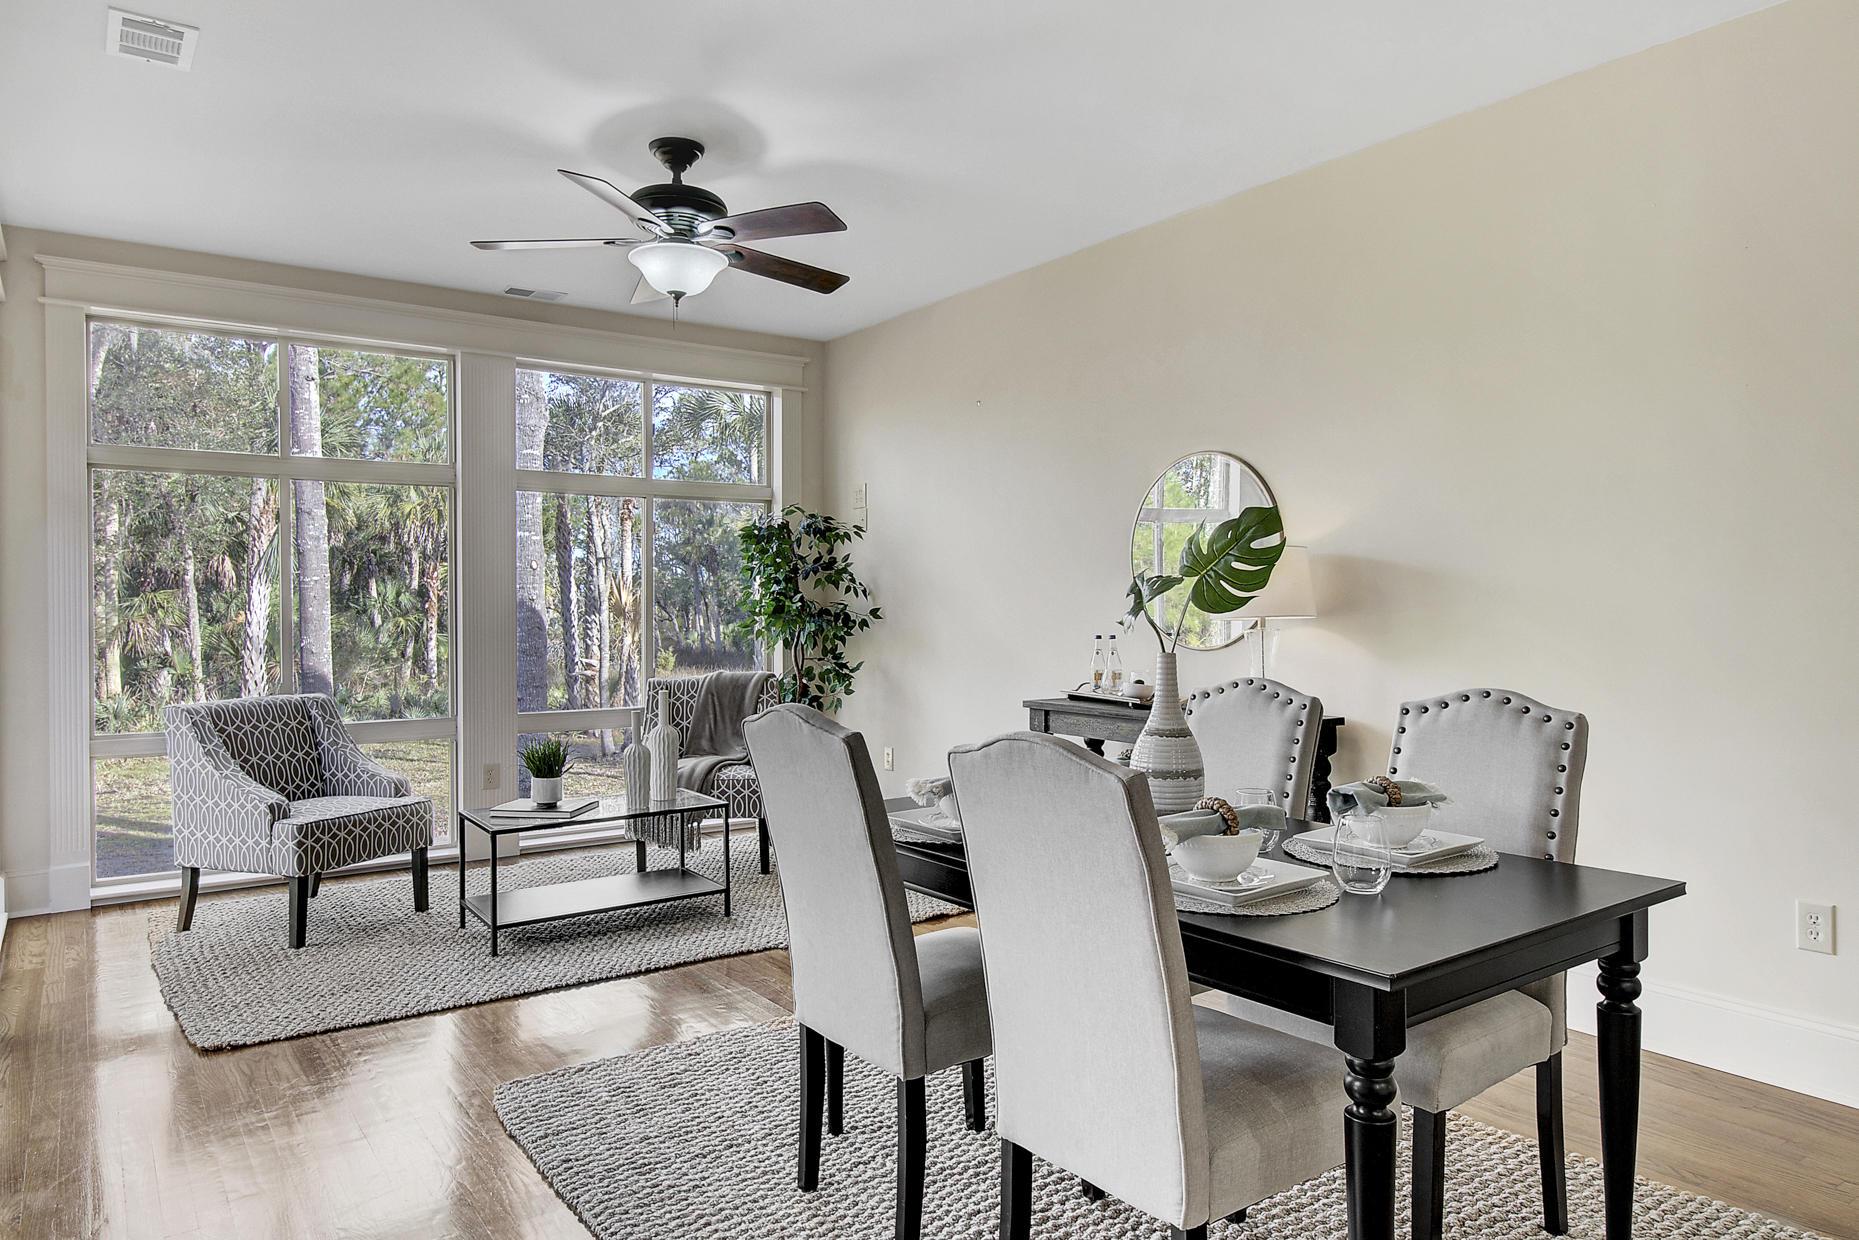 Dunes West Homes For Sale - 4123 Colonel Vanderhorst, Mount Pleasant, SC - 16